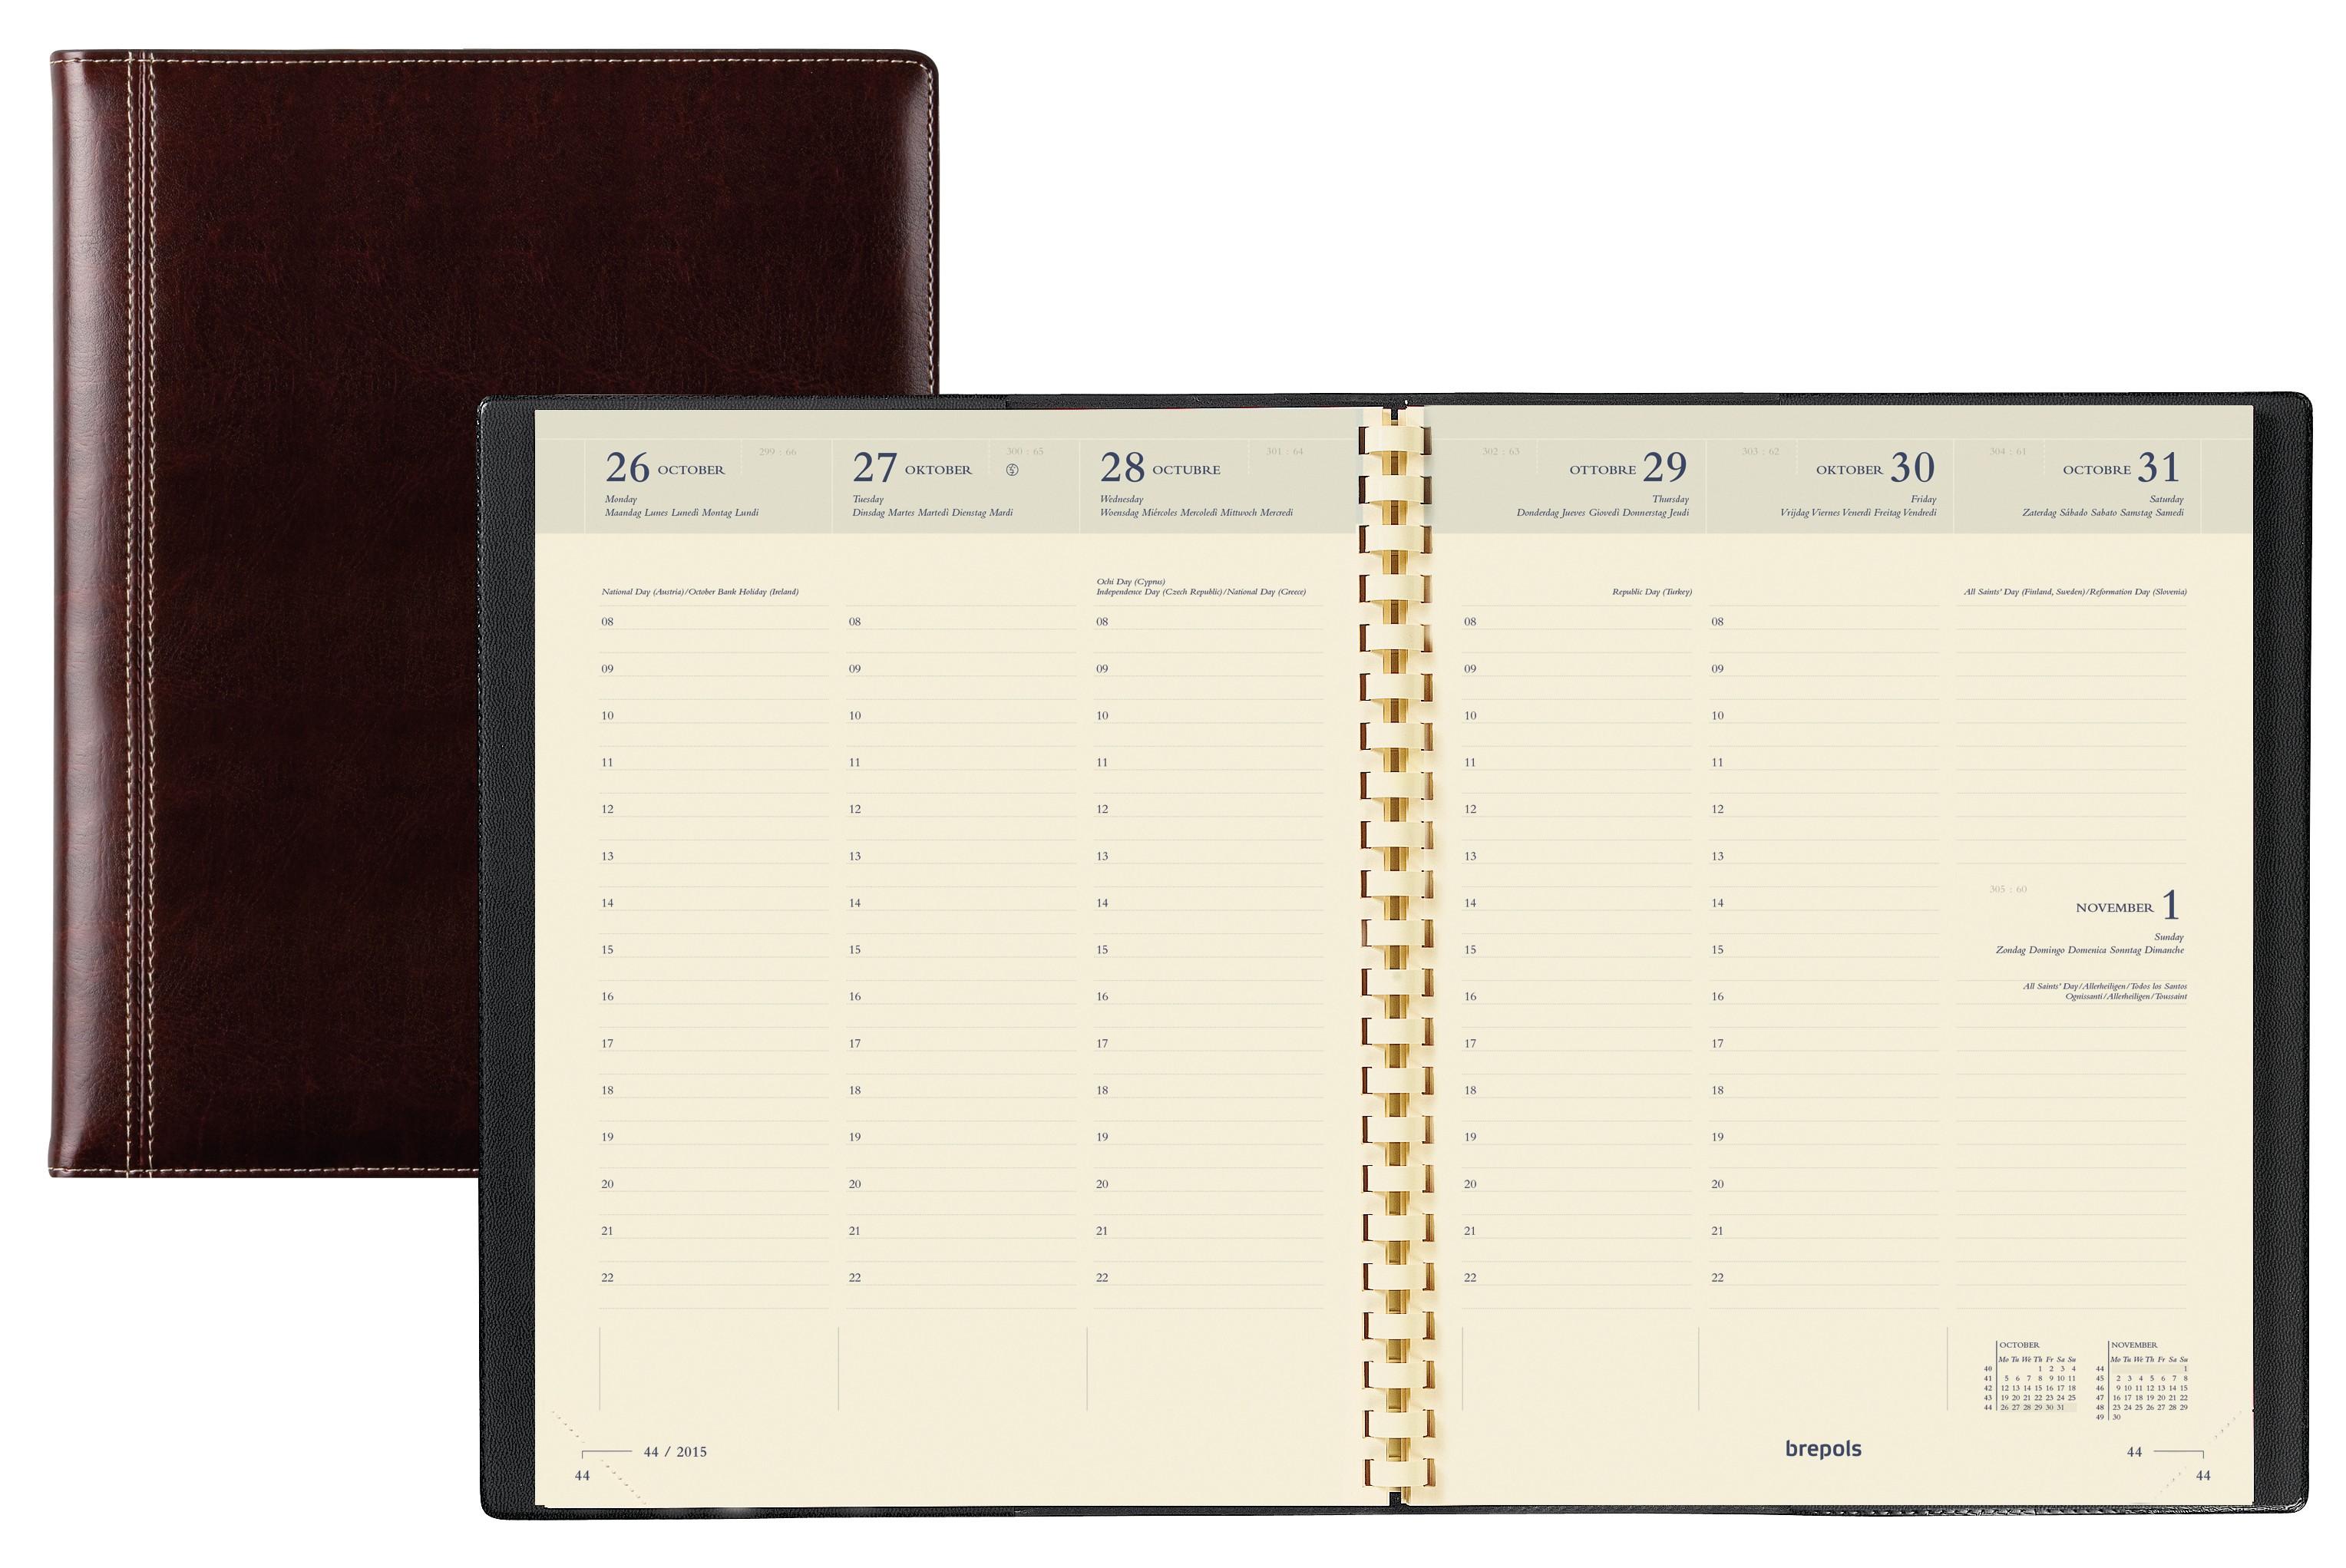 Agenda Palermo Timing - 1 semaine sur 2 pages - 17 x 22 cm - marron - Brepols